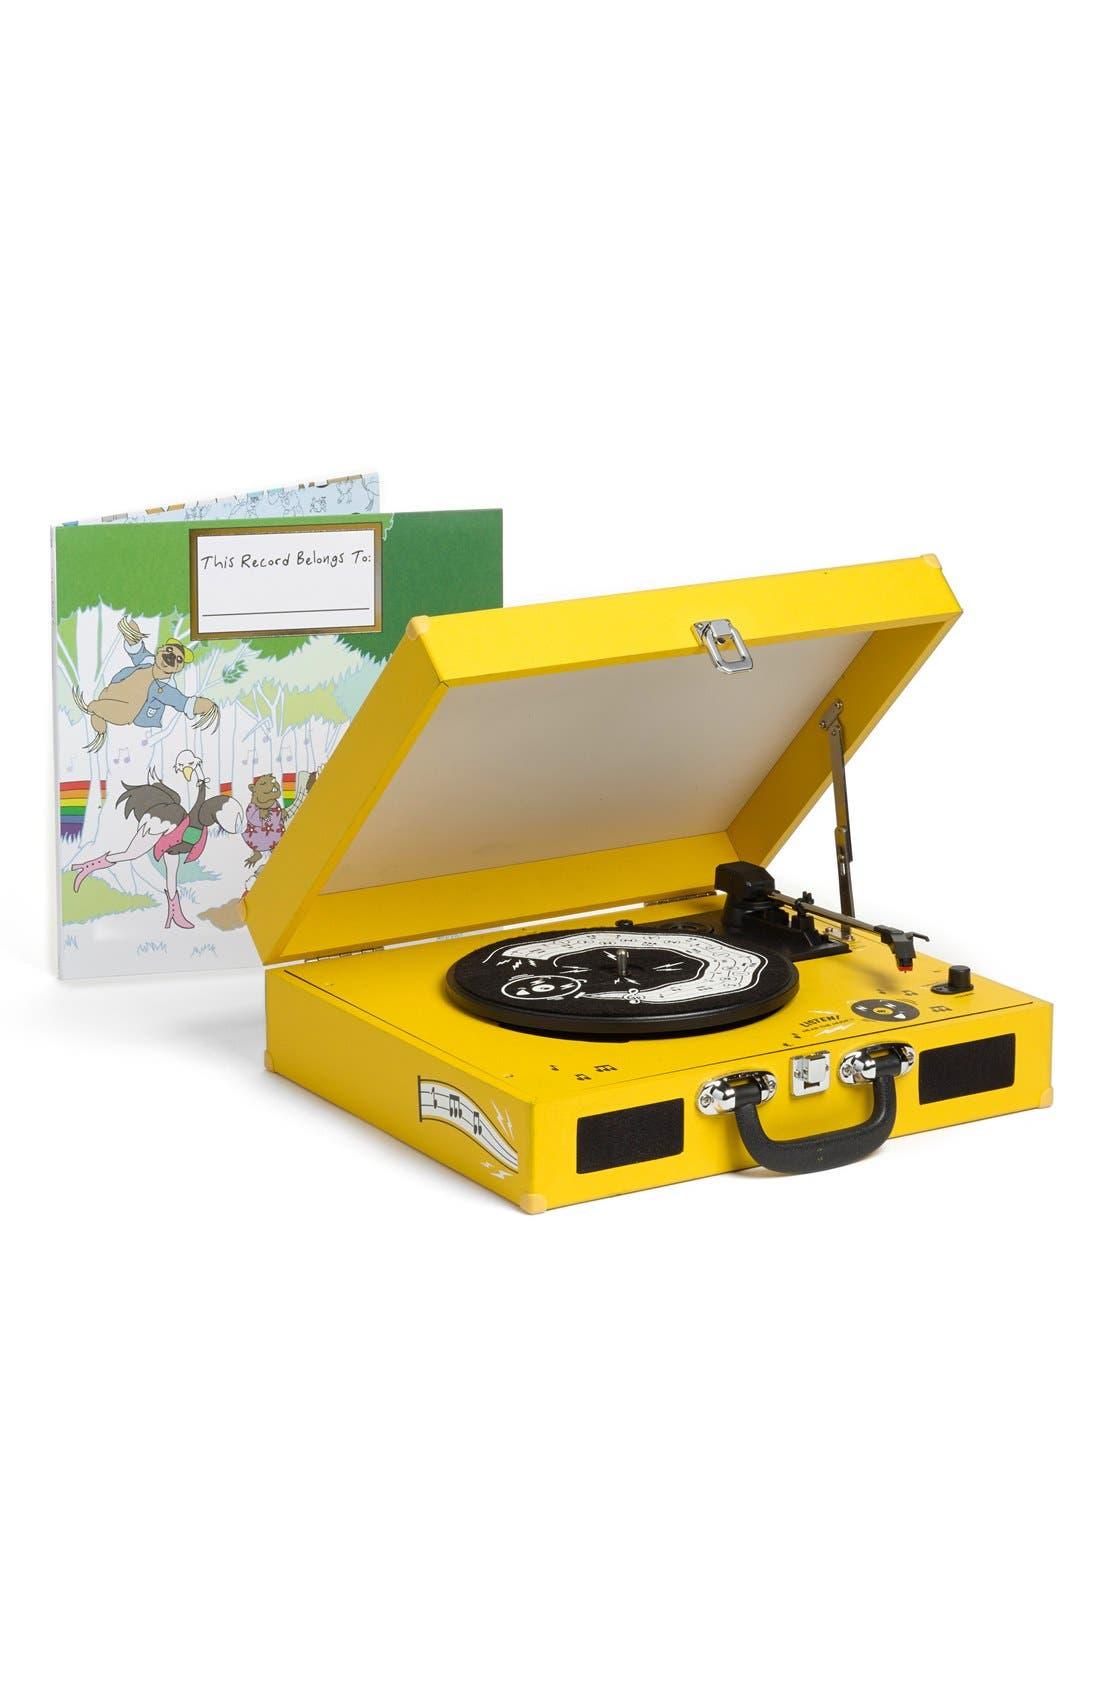 The Third Man Mini Record Player & This Record Belongs To ___ Storybook & LP Set,                             Main thumbnail 1, color,                             700